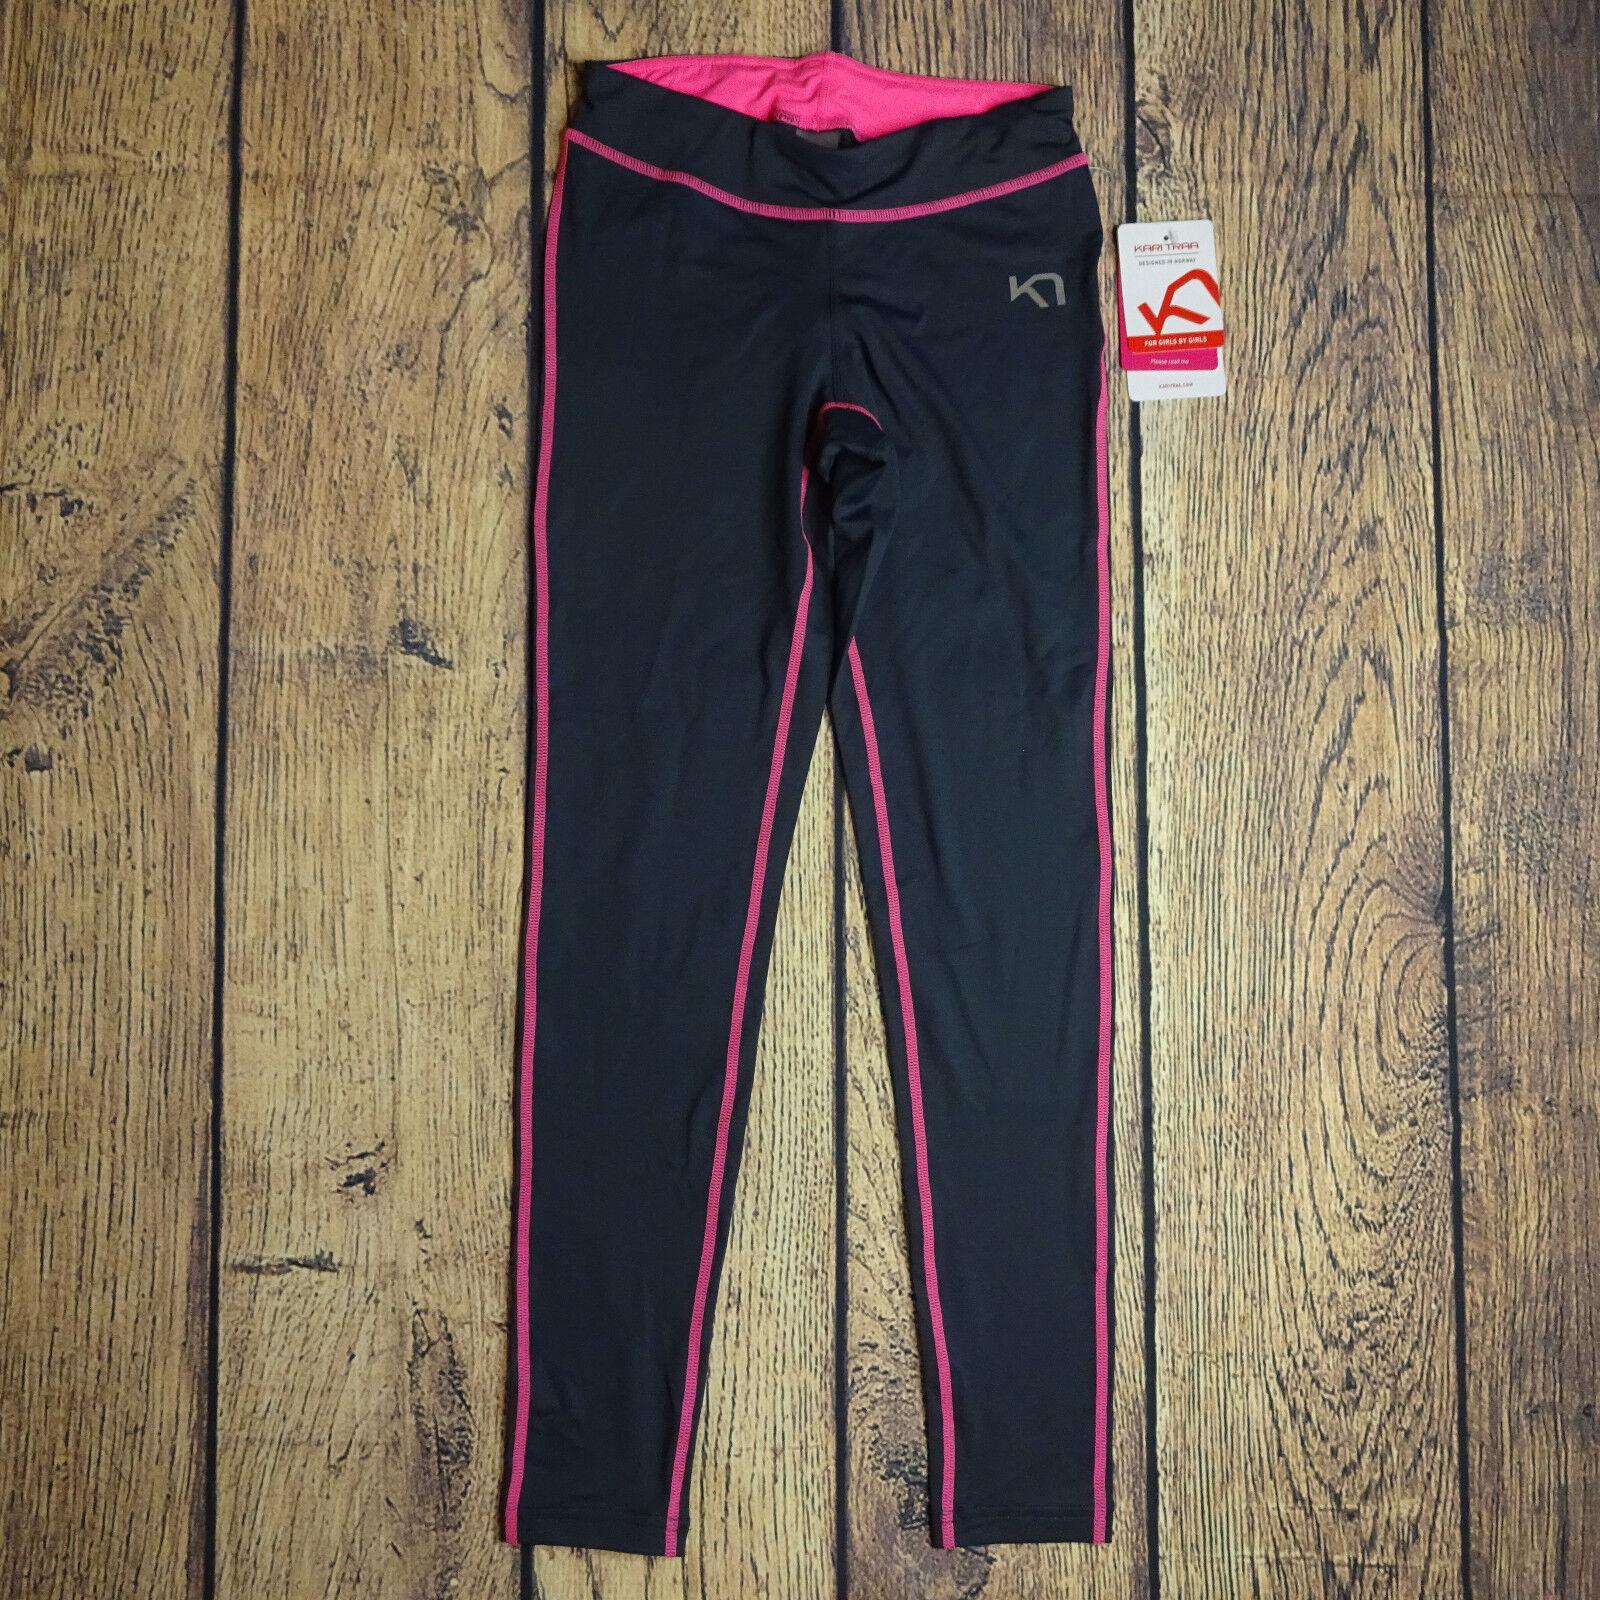 Kari Traa Medium Myrbla Tights Ebony rosa Gym Athletic NEW Norway